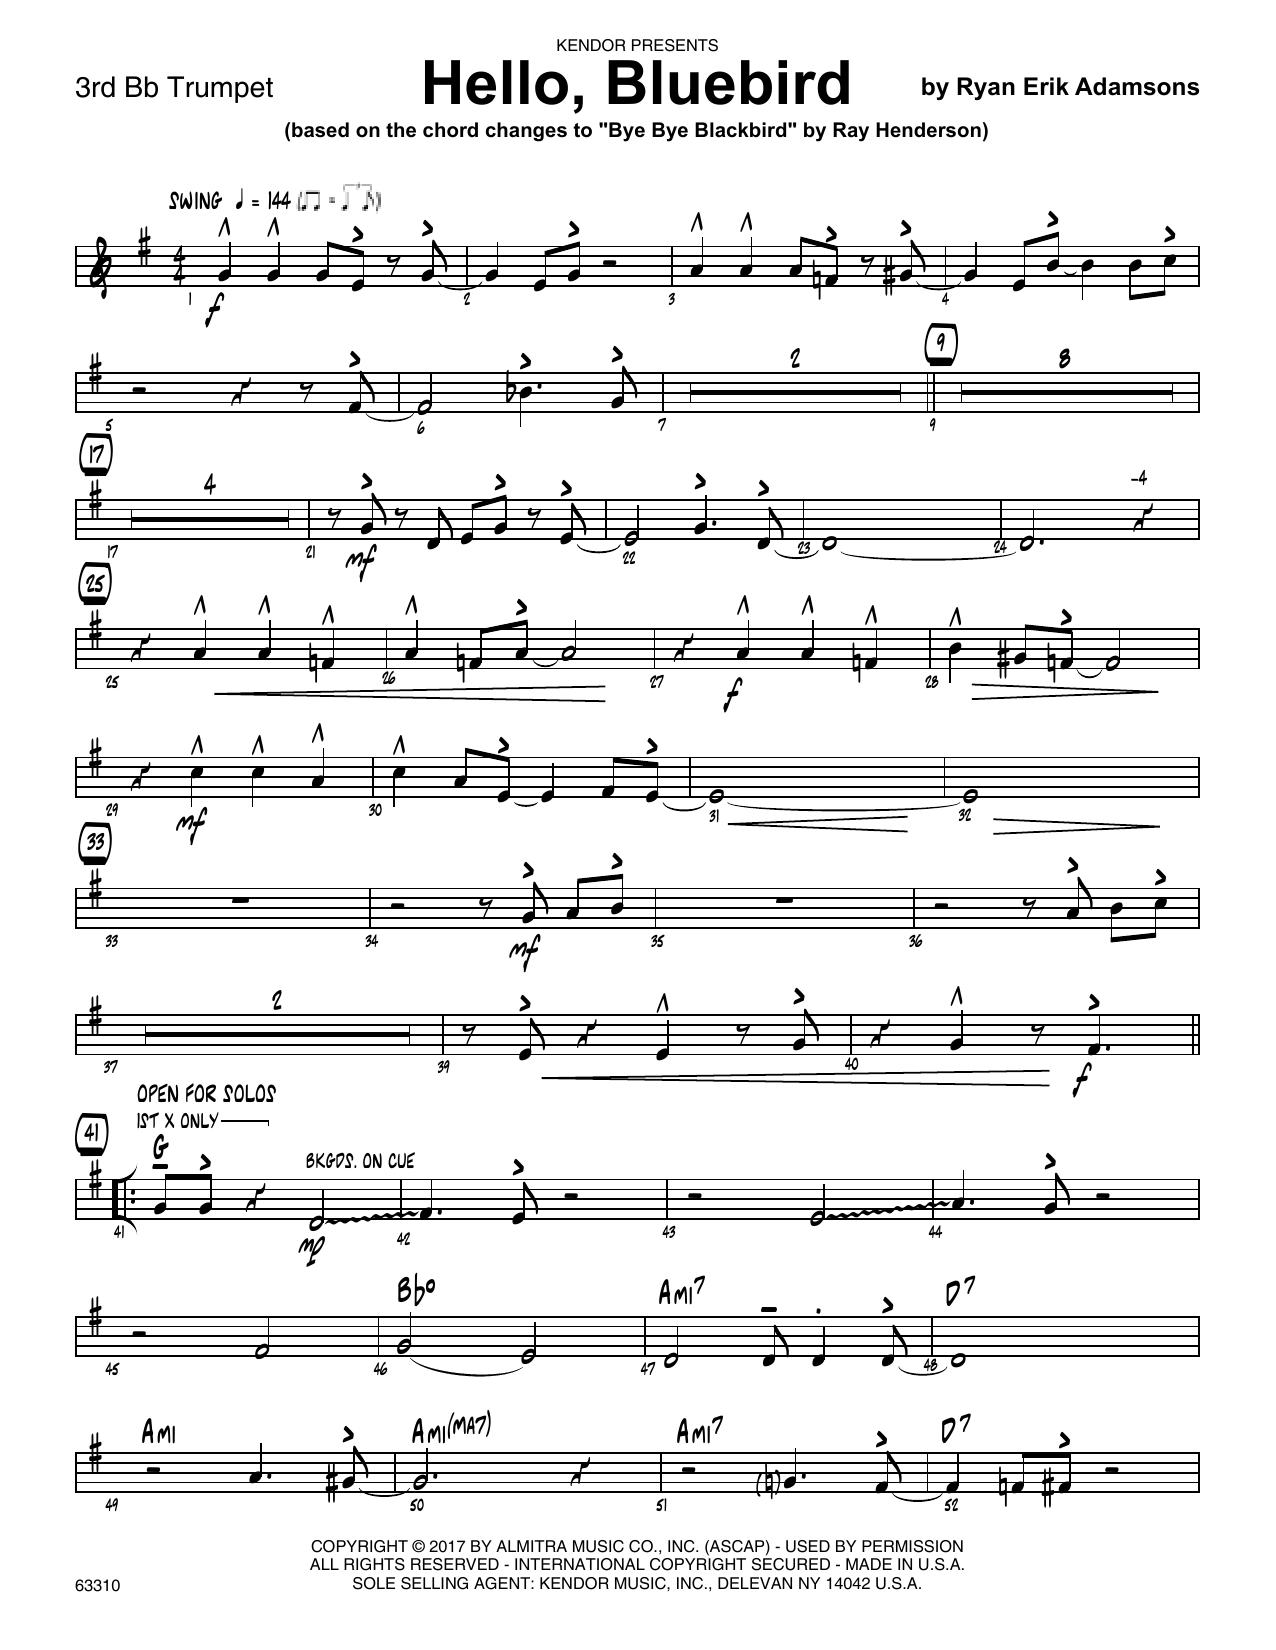 Ryan Erik Adamsons Hello, Bluebird (based on Bye Bye Blackbird) - 3rd Bb Trumpet sheet music notes printable PDF score